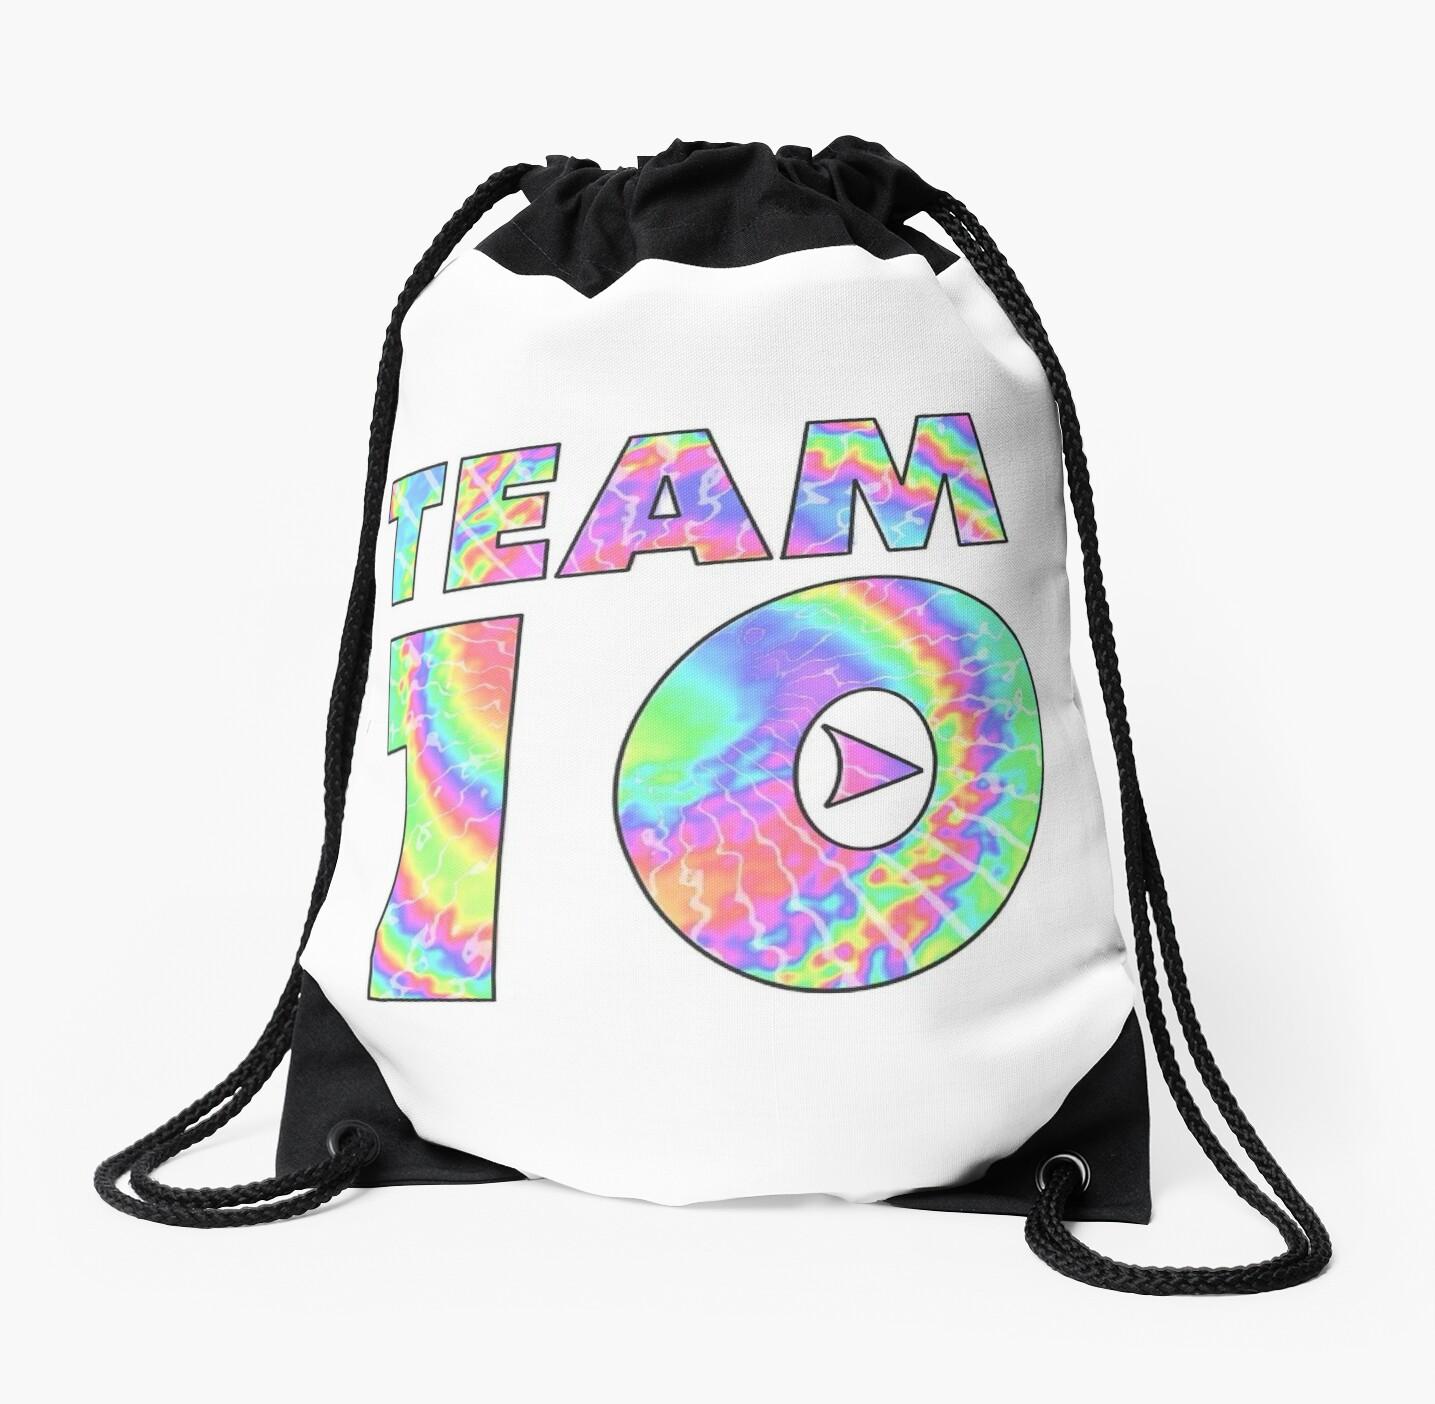 Team 10 Tie Dye Jake Paul